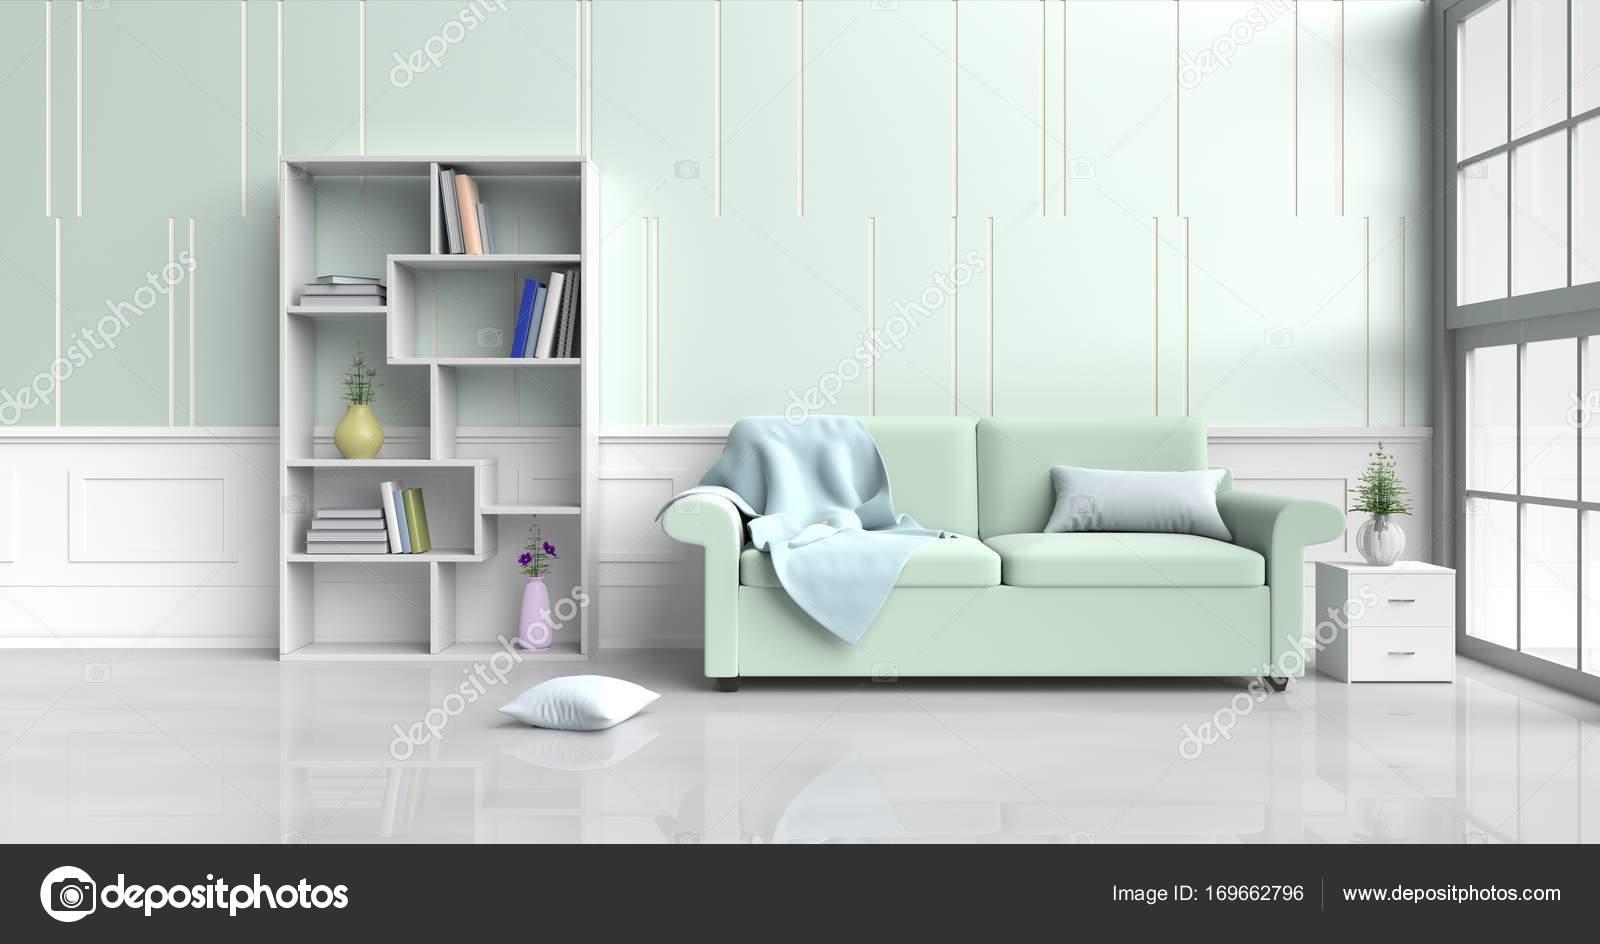 https://st3.depositphotos.com/12406876/16966/i/1600/depositphotos_169662796-stockafbeelding-wit-groen-kamer-is-ingericht.jpg